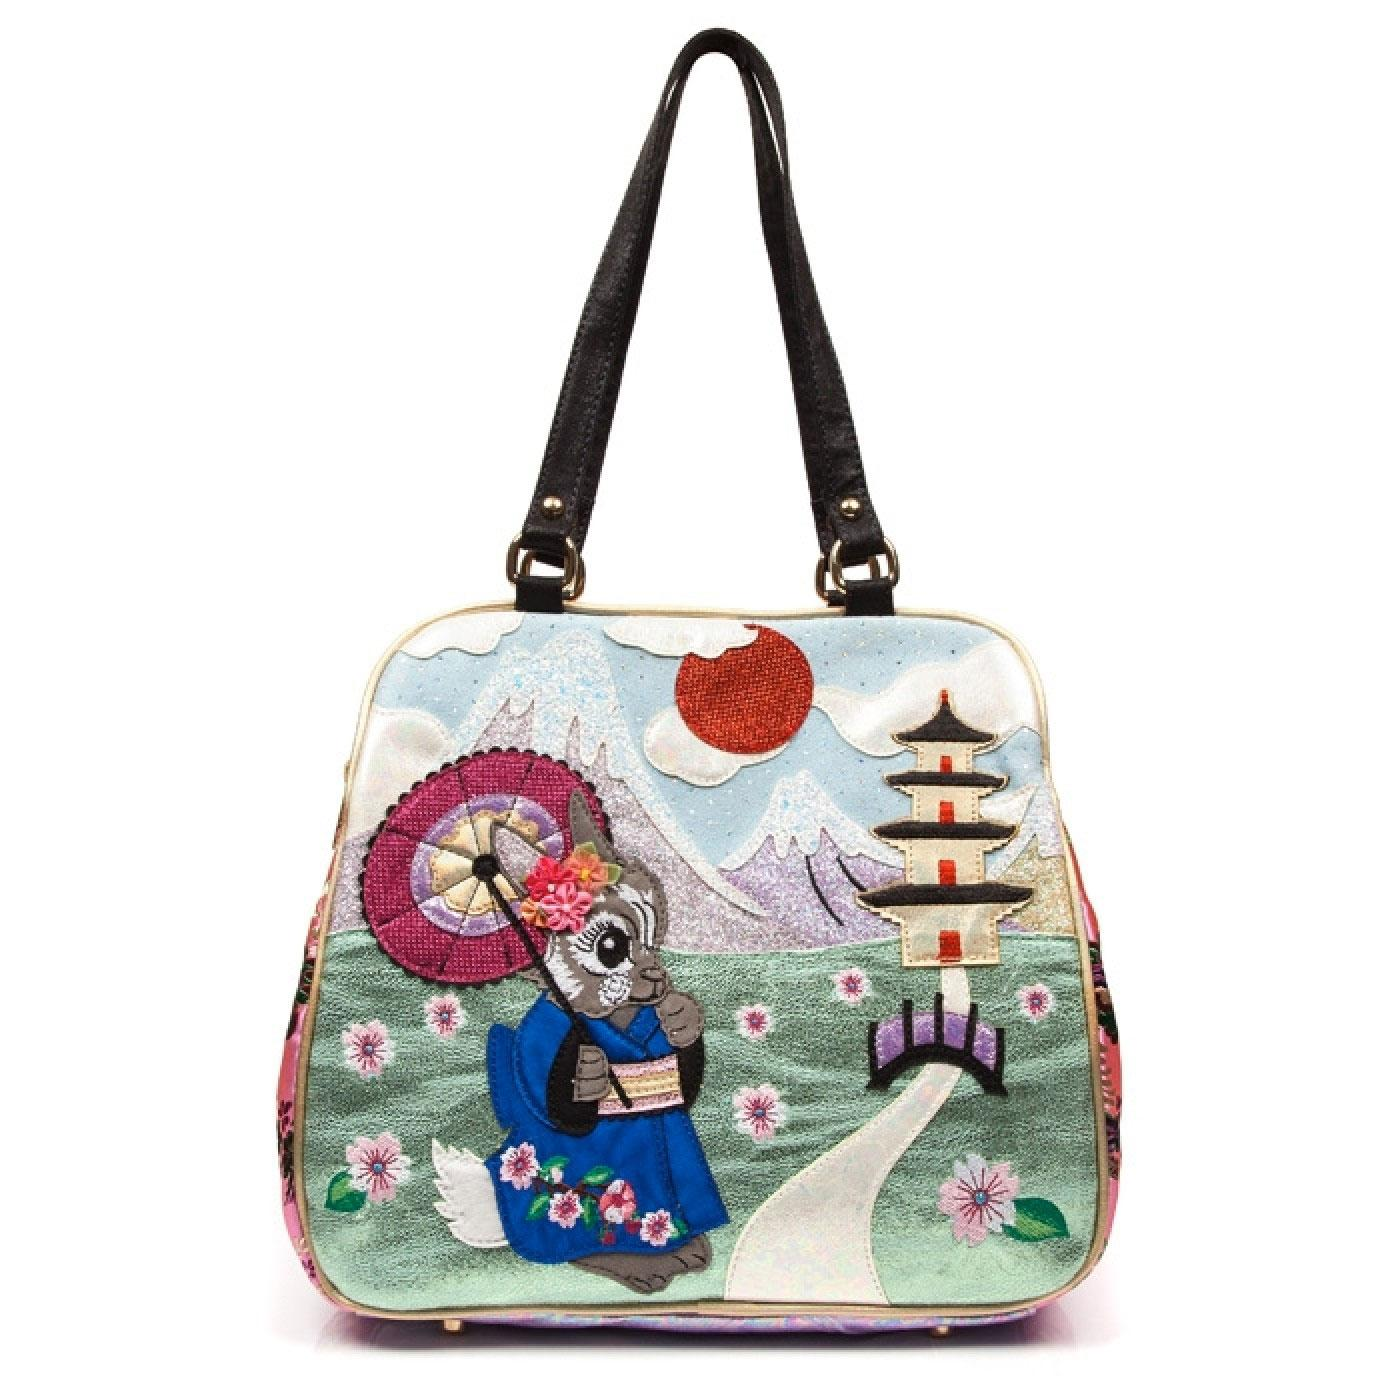 Blossom Bunny IRREGULAR CHOICE Japanese Handbag